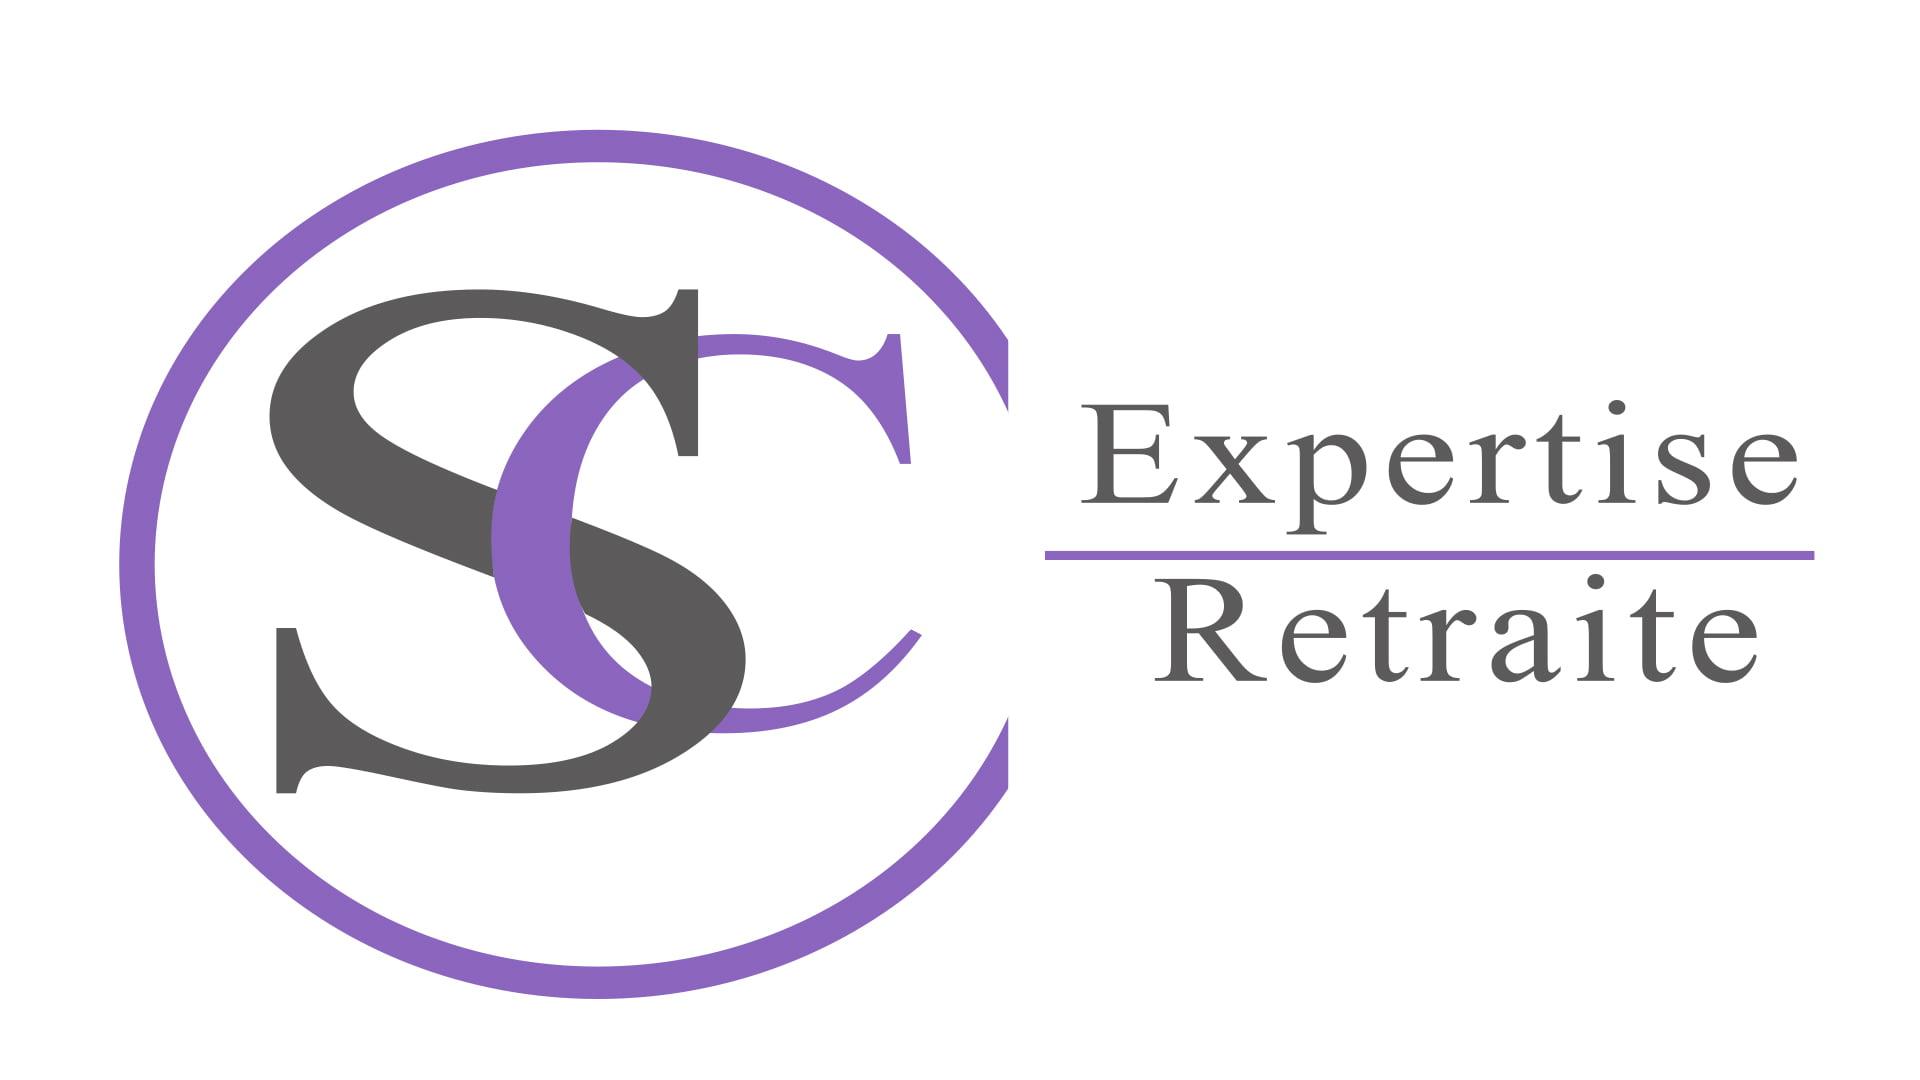 SC Expertise Retraite